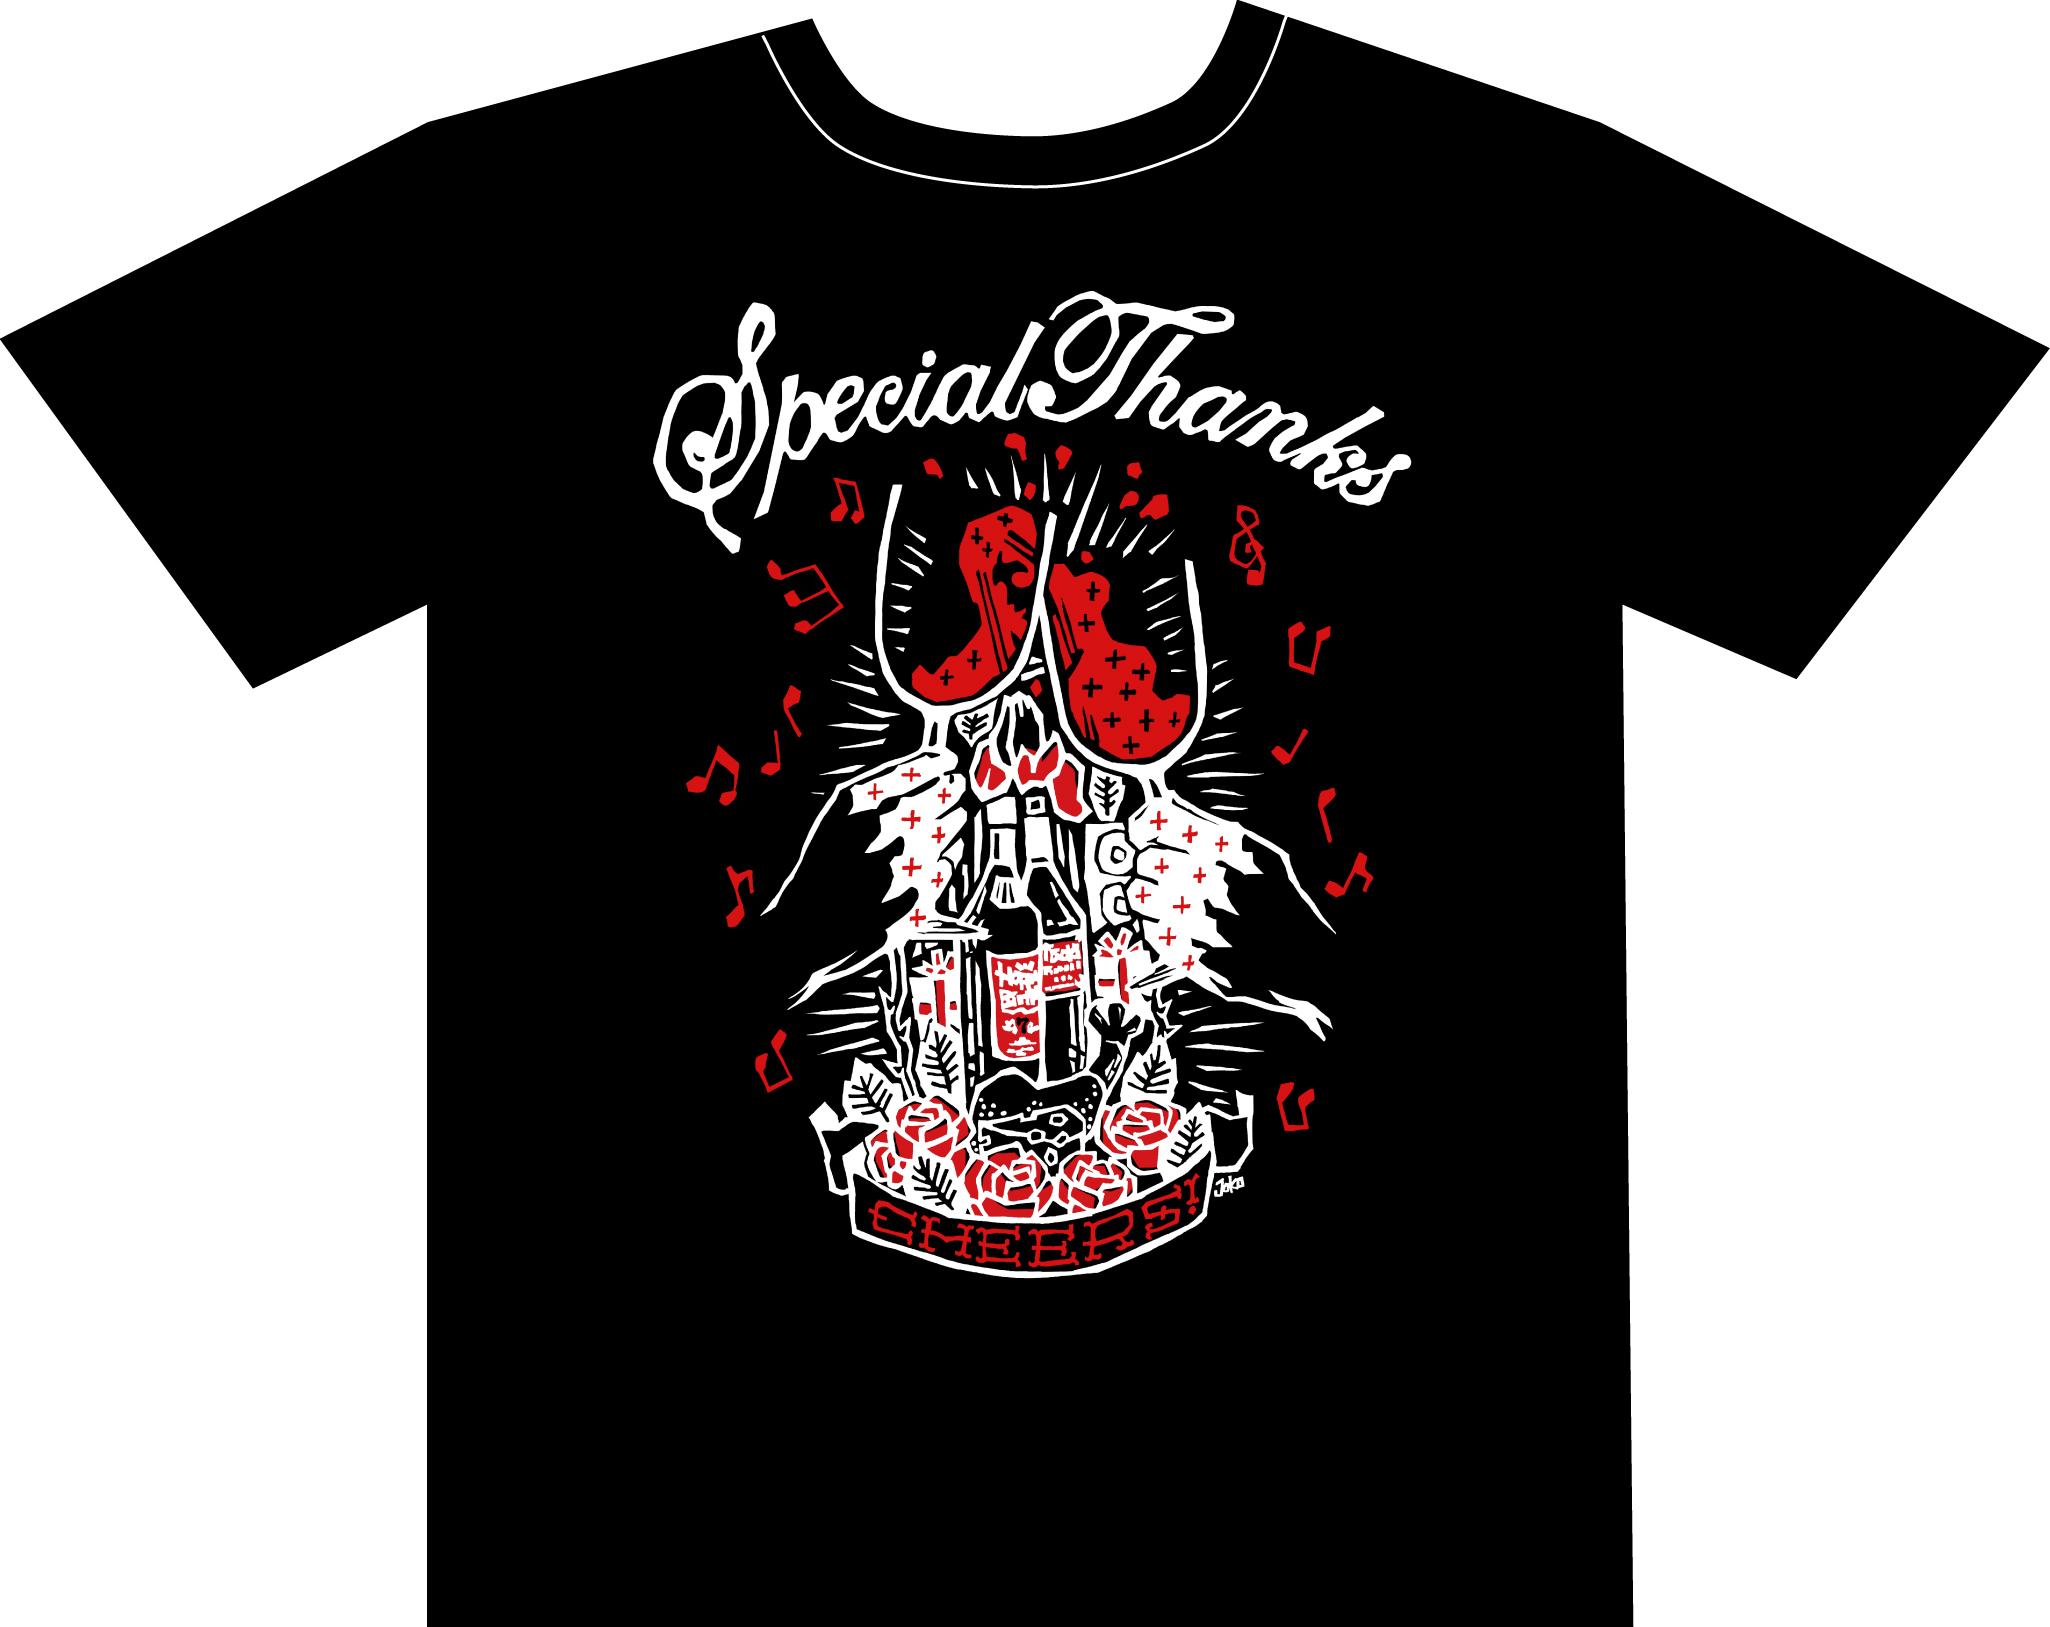 SpecialThanksのNEW Tシャツ予約受付開始!【KOGA RECORDS】_b0154973_20313516.jpg